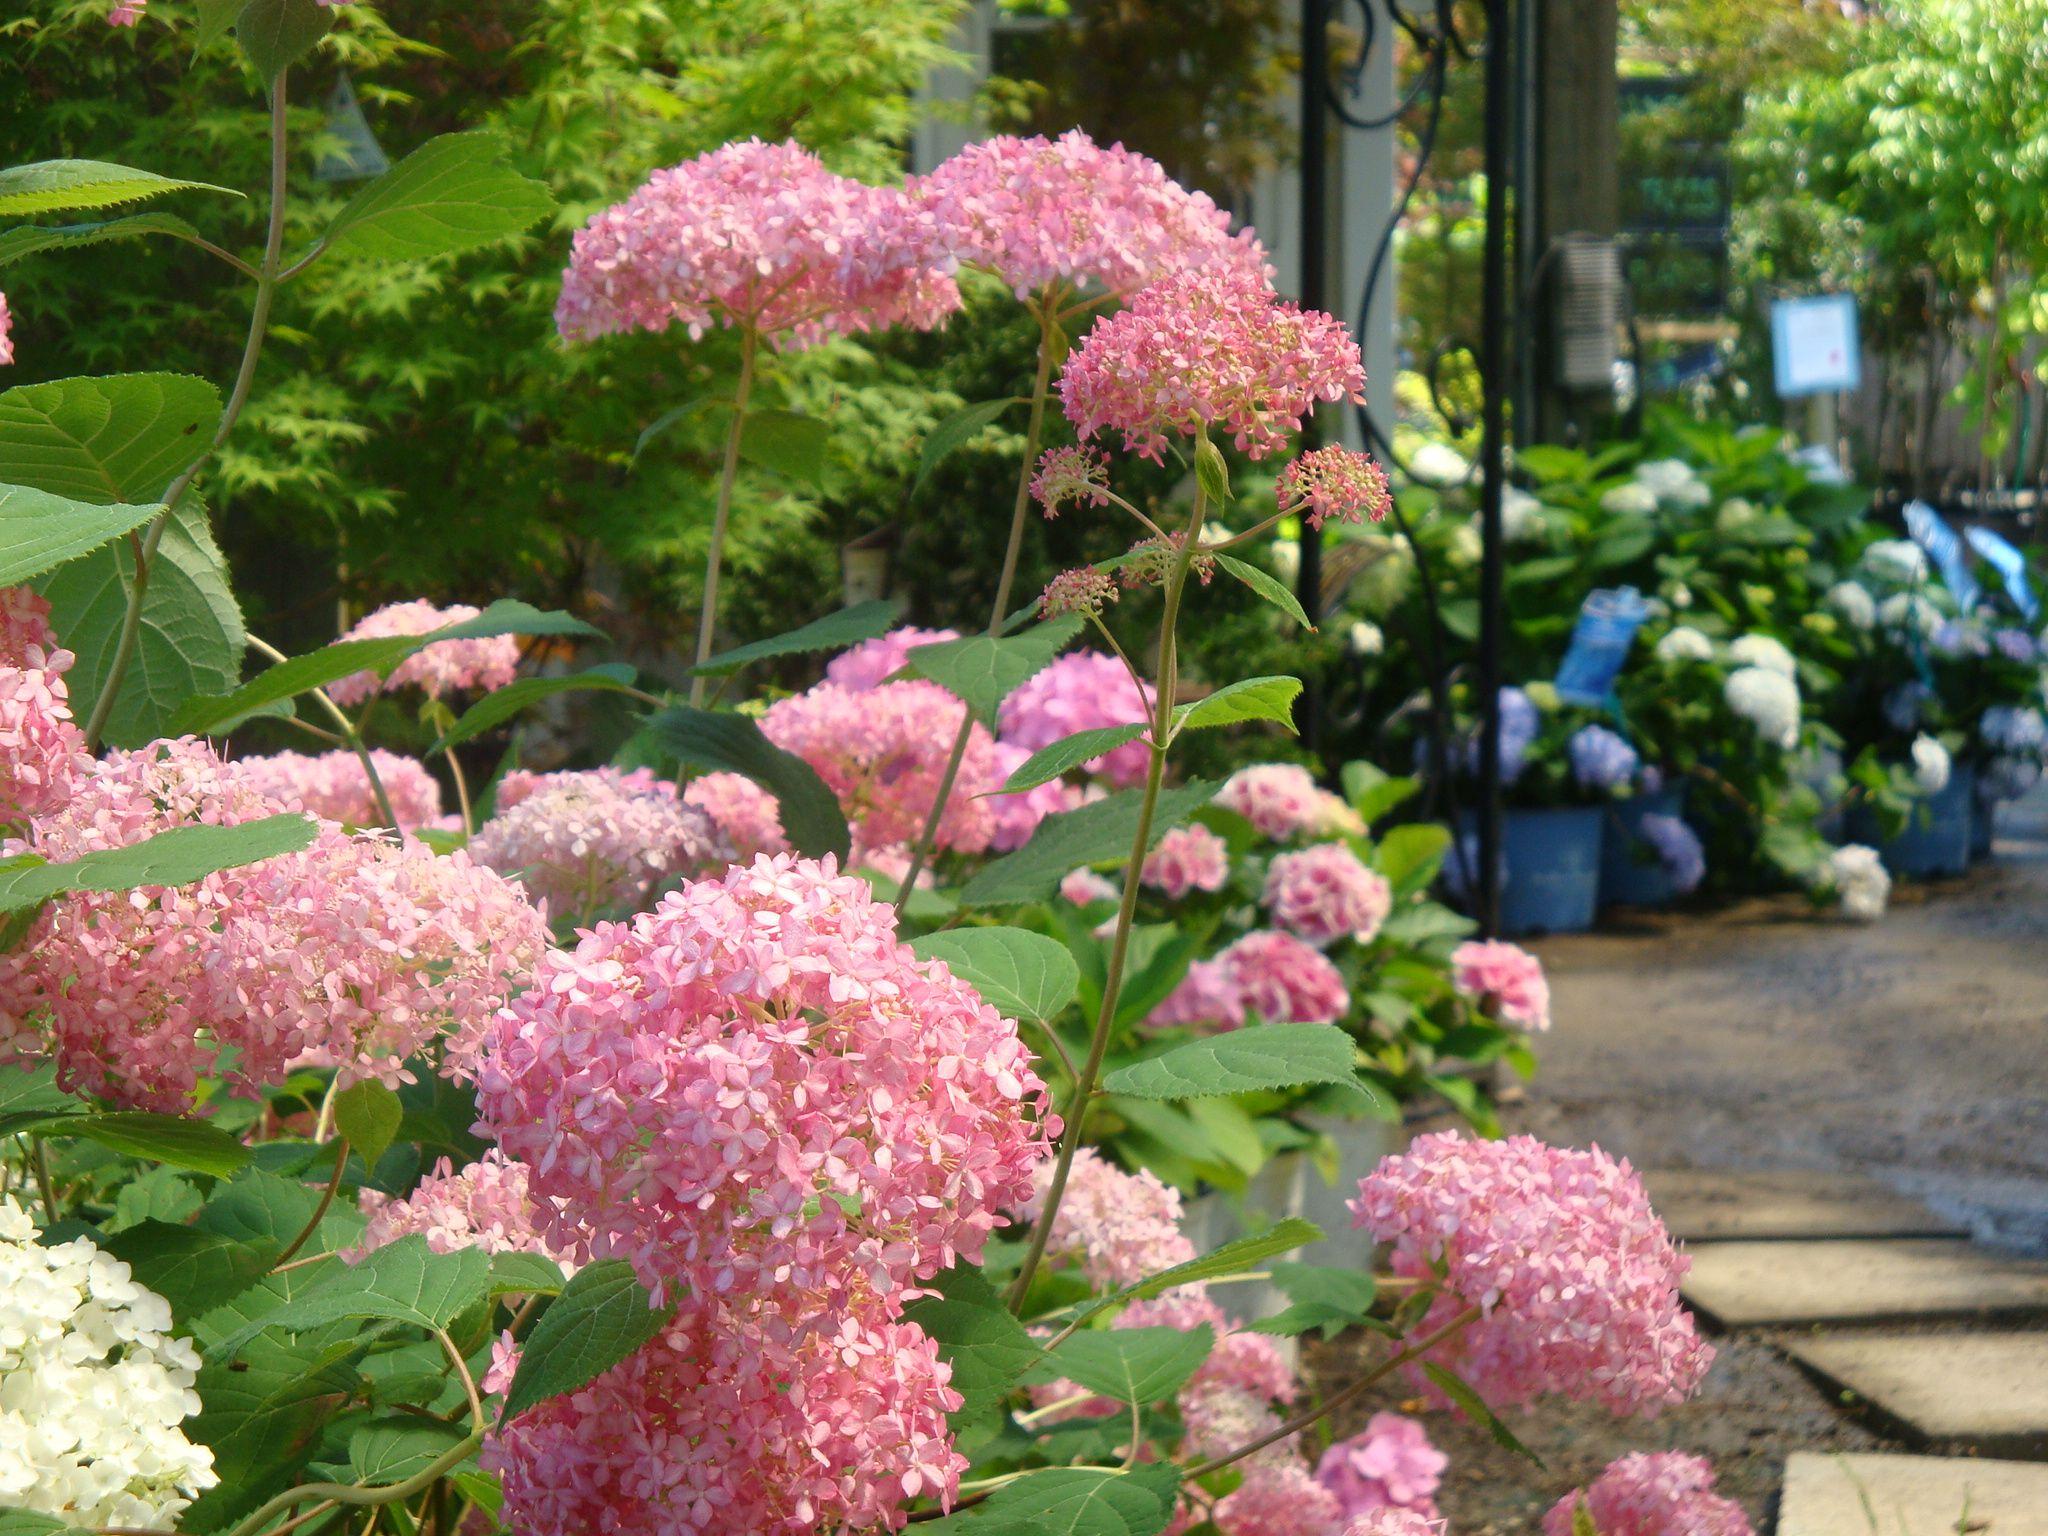 Invincibelle spiritu hydrangea beautiful pink blooms beautiful